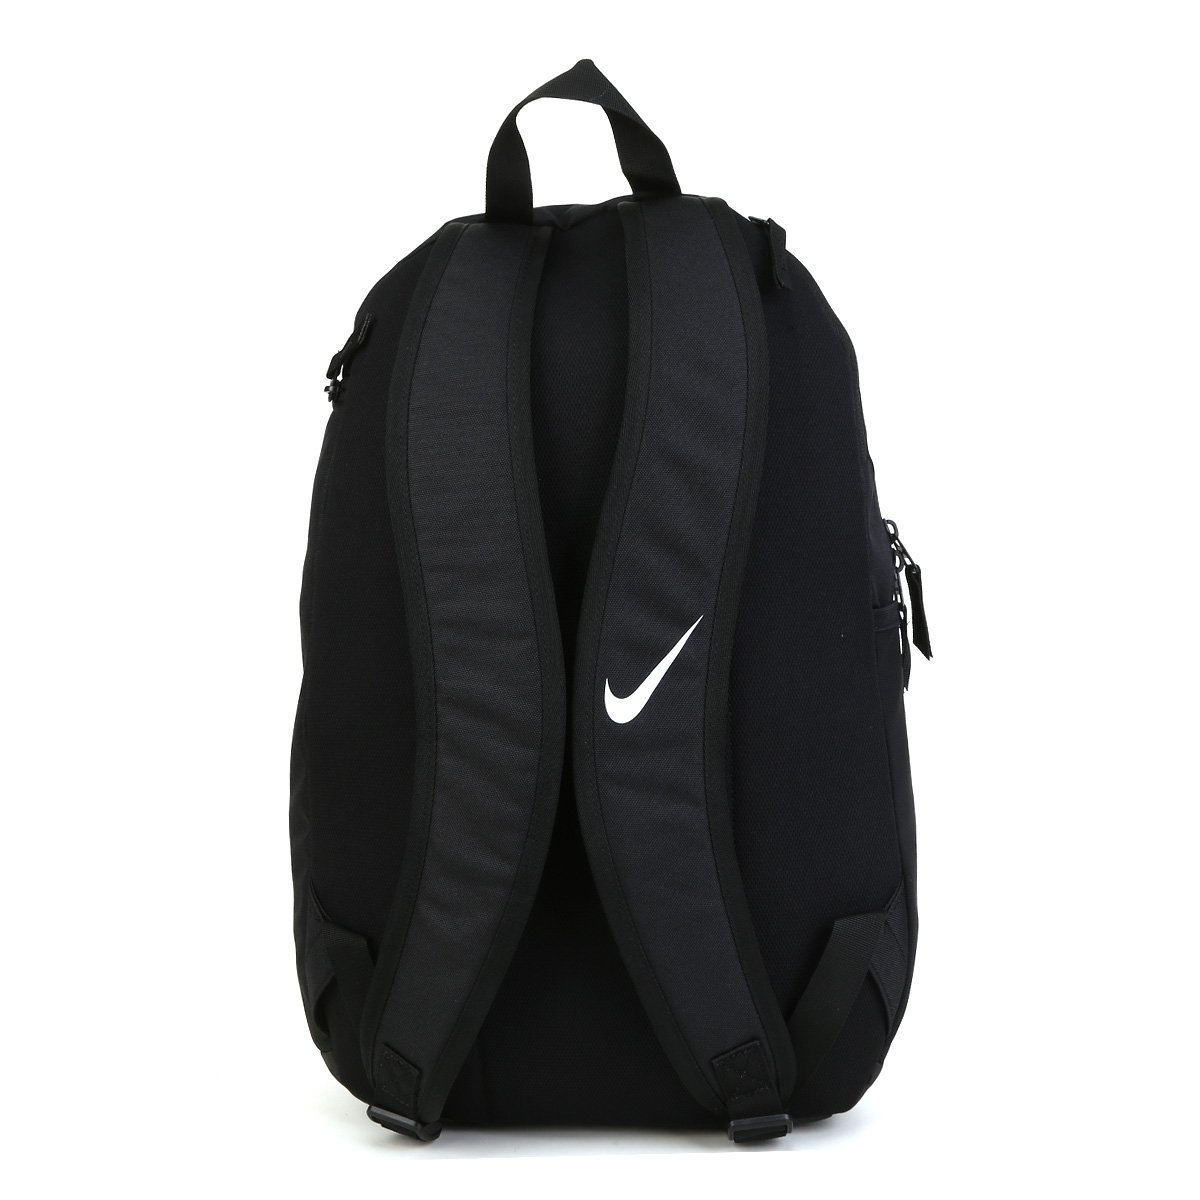 Sui preferible No autorizado  Mochila Nike Academy Team - Preto e Branco | Netshoes